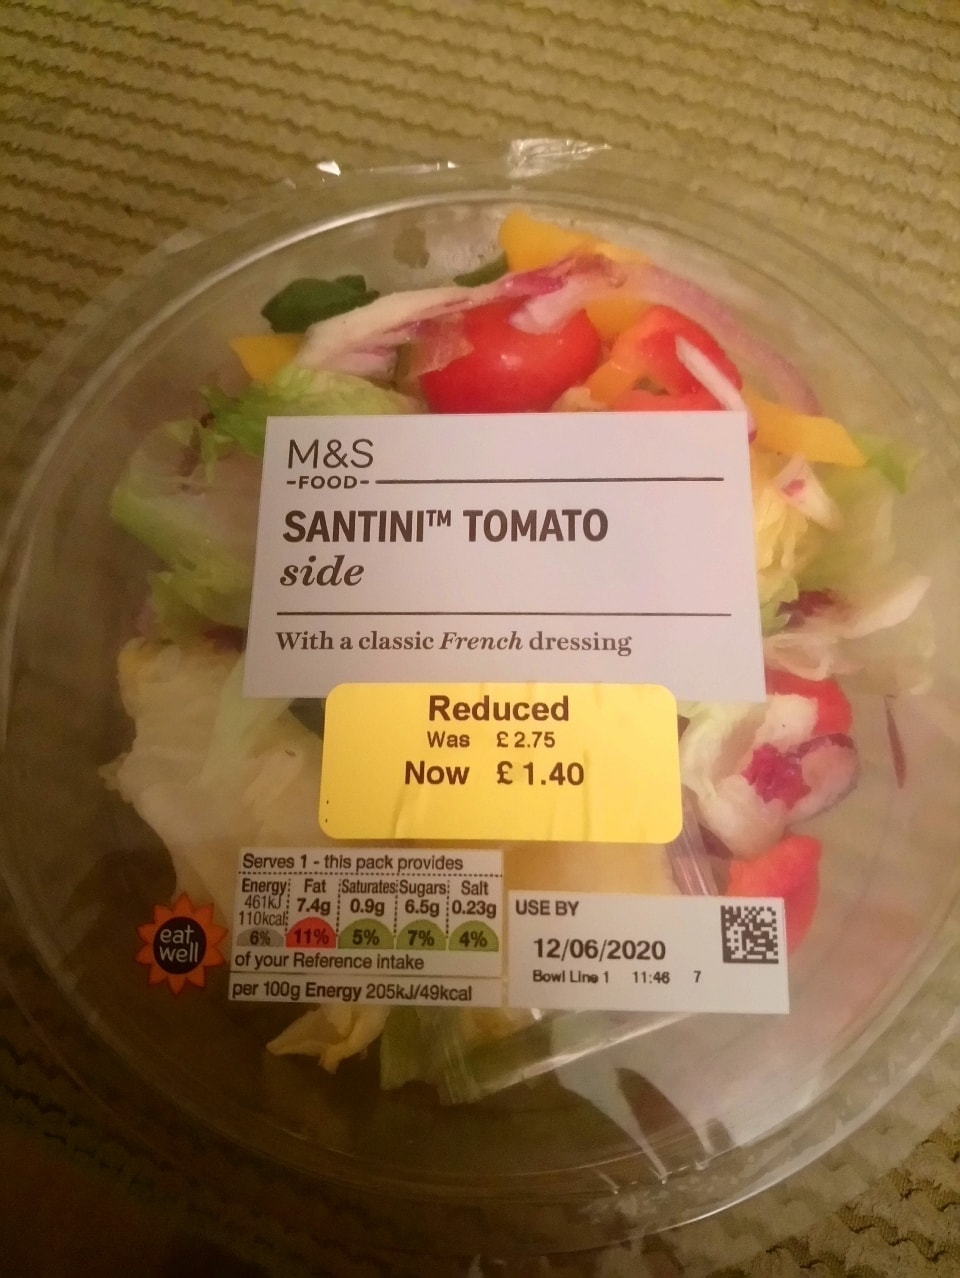 Santini tomato salad